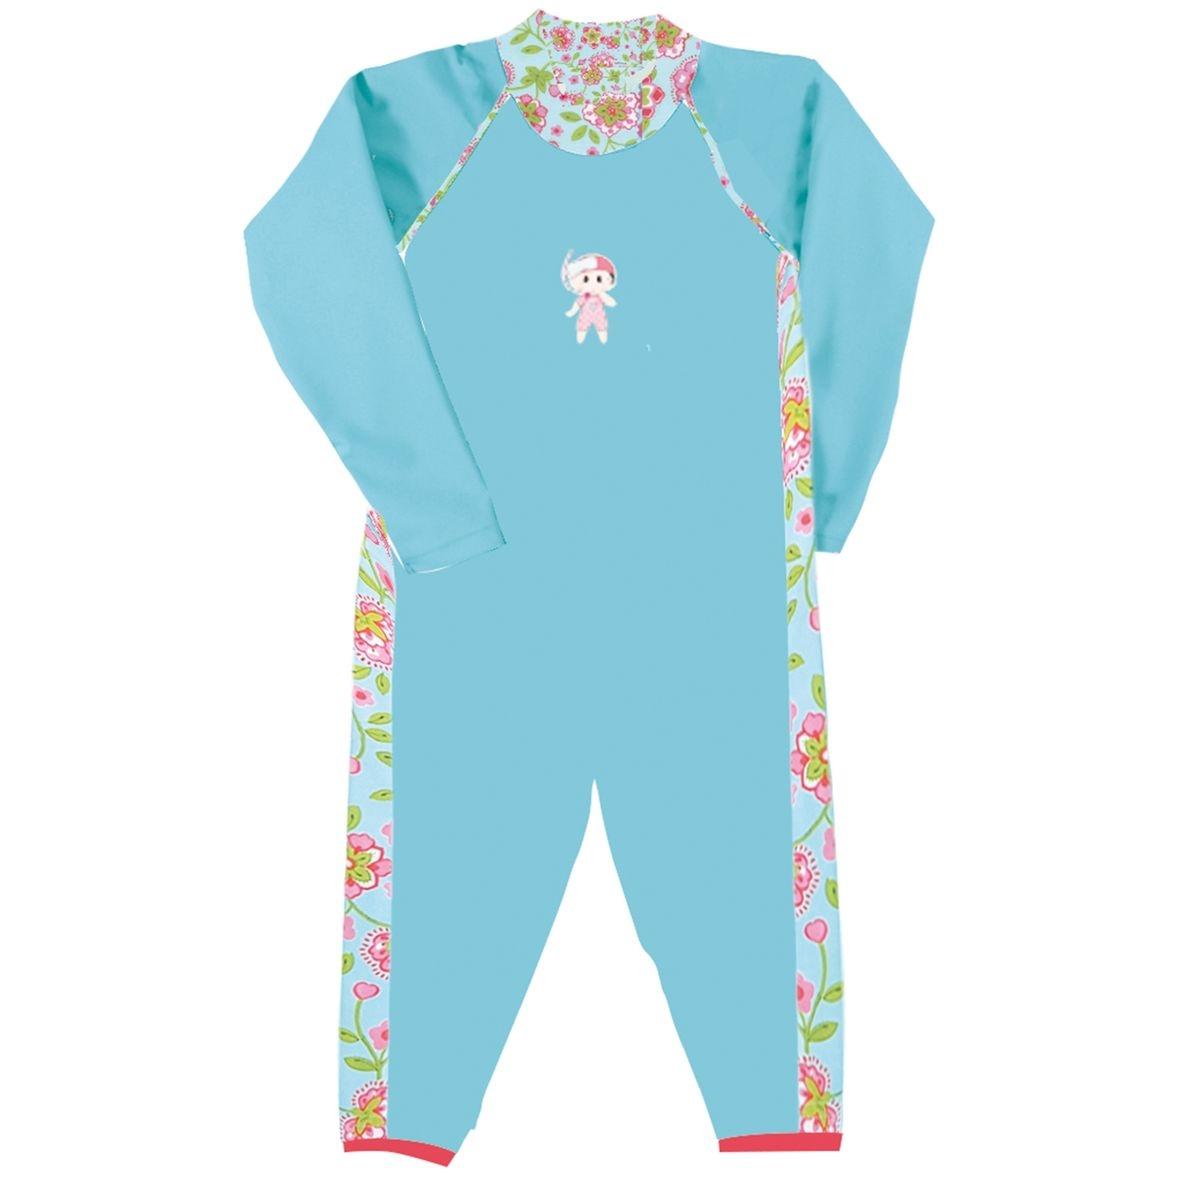 Mini Princesse   Combinaison maillot anti UV fille manches longues